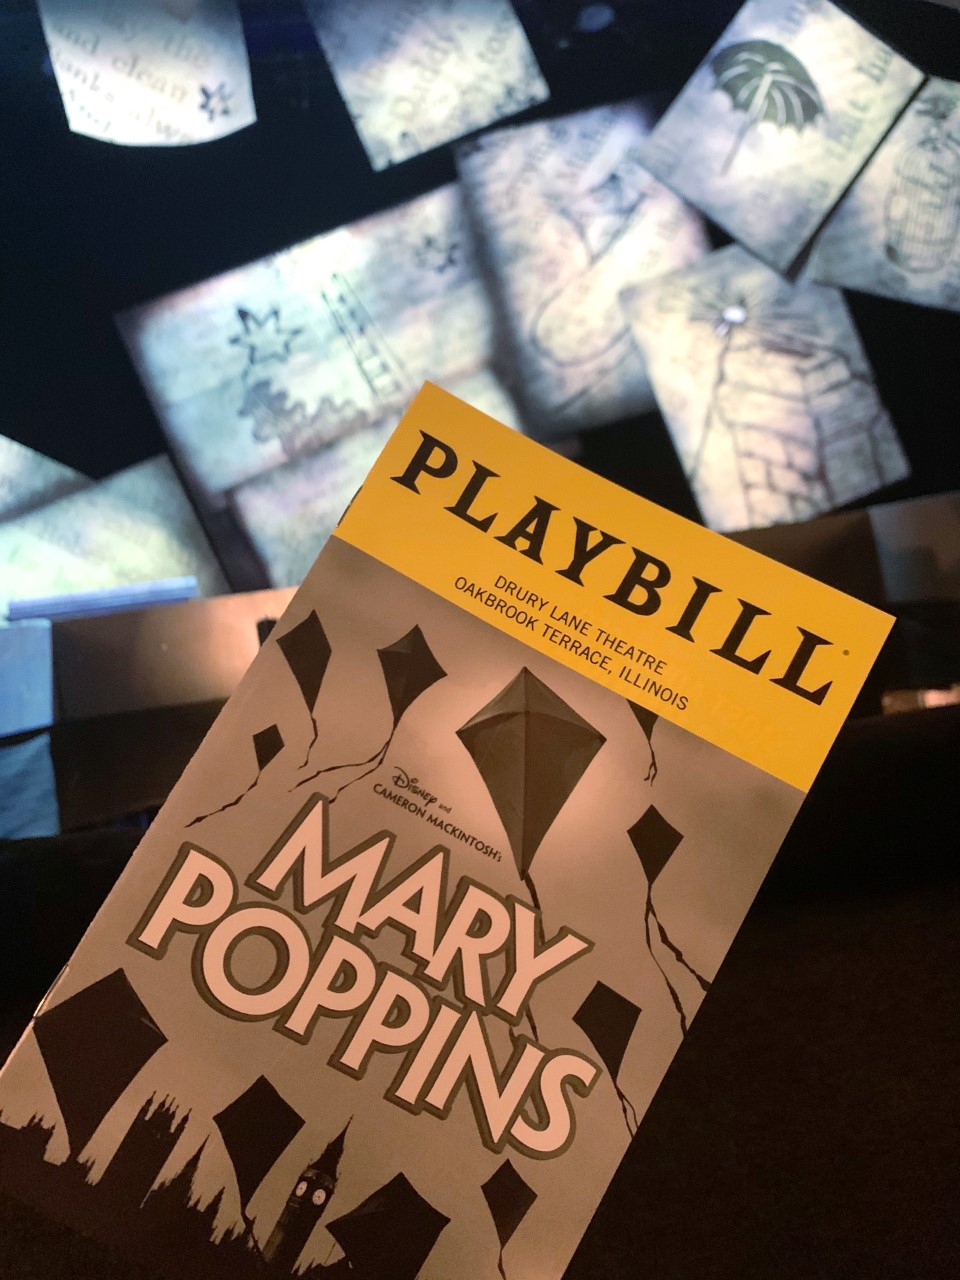 Mary Poppins Drury Lane Theatre